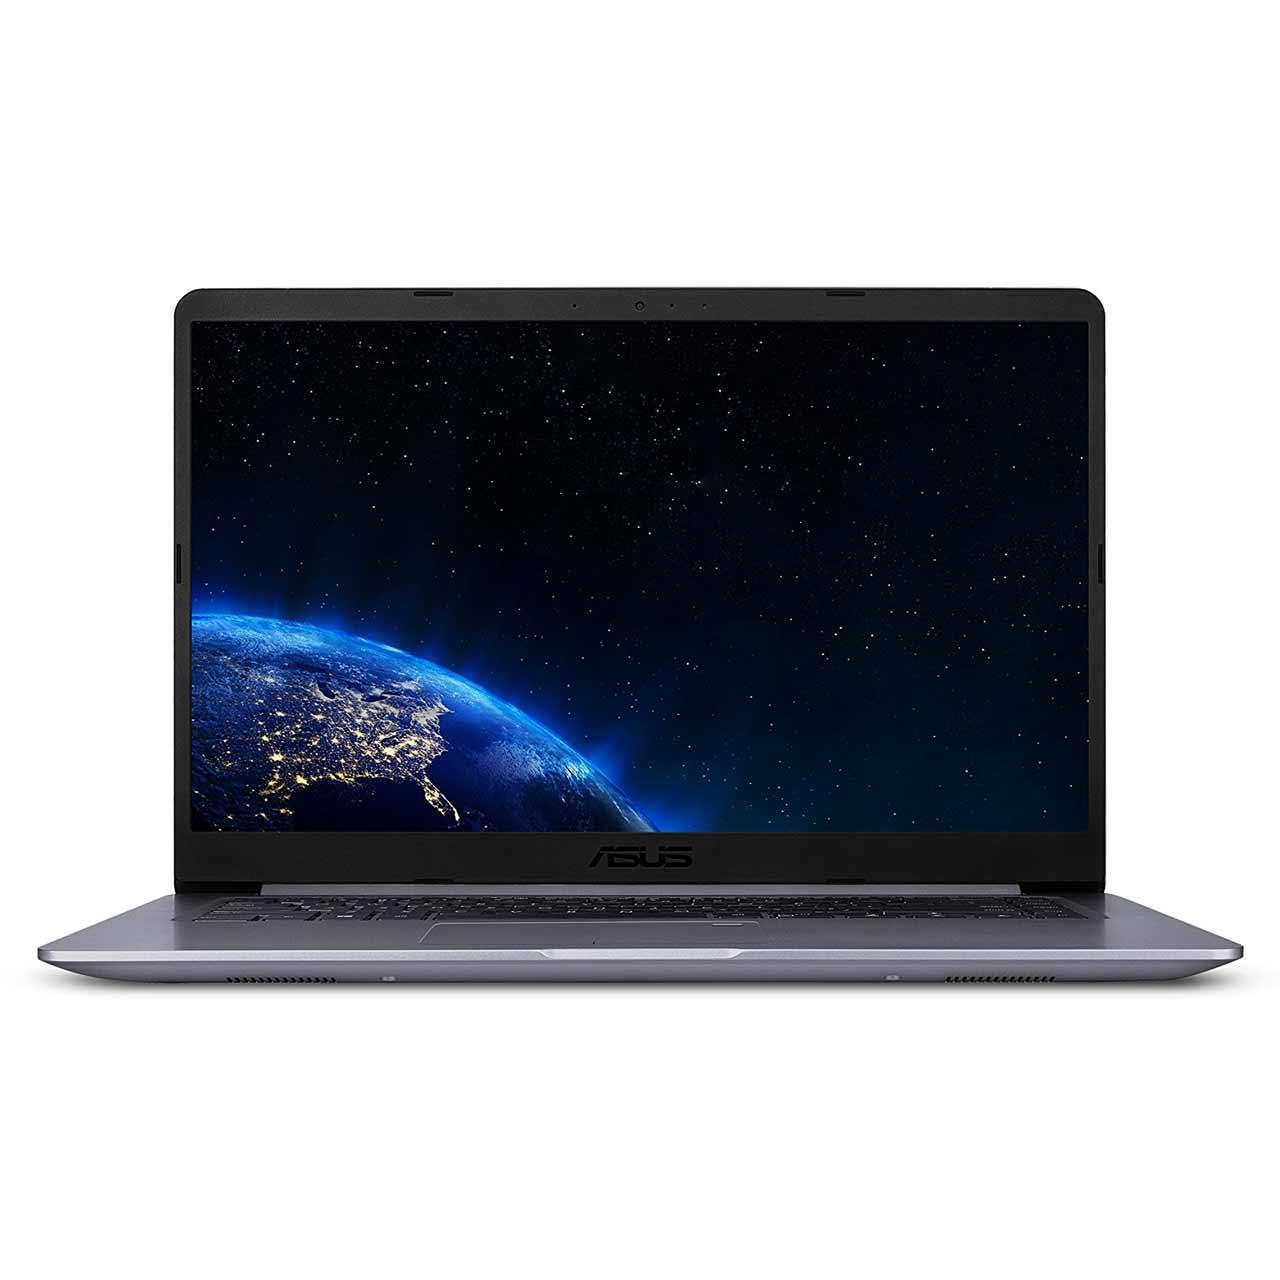 "Asus VivoBook S14 S410UA 14"" Laptop - Grey £349 @ AO"